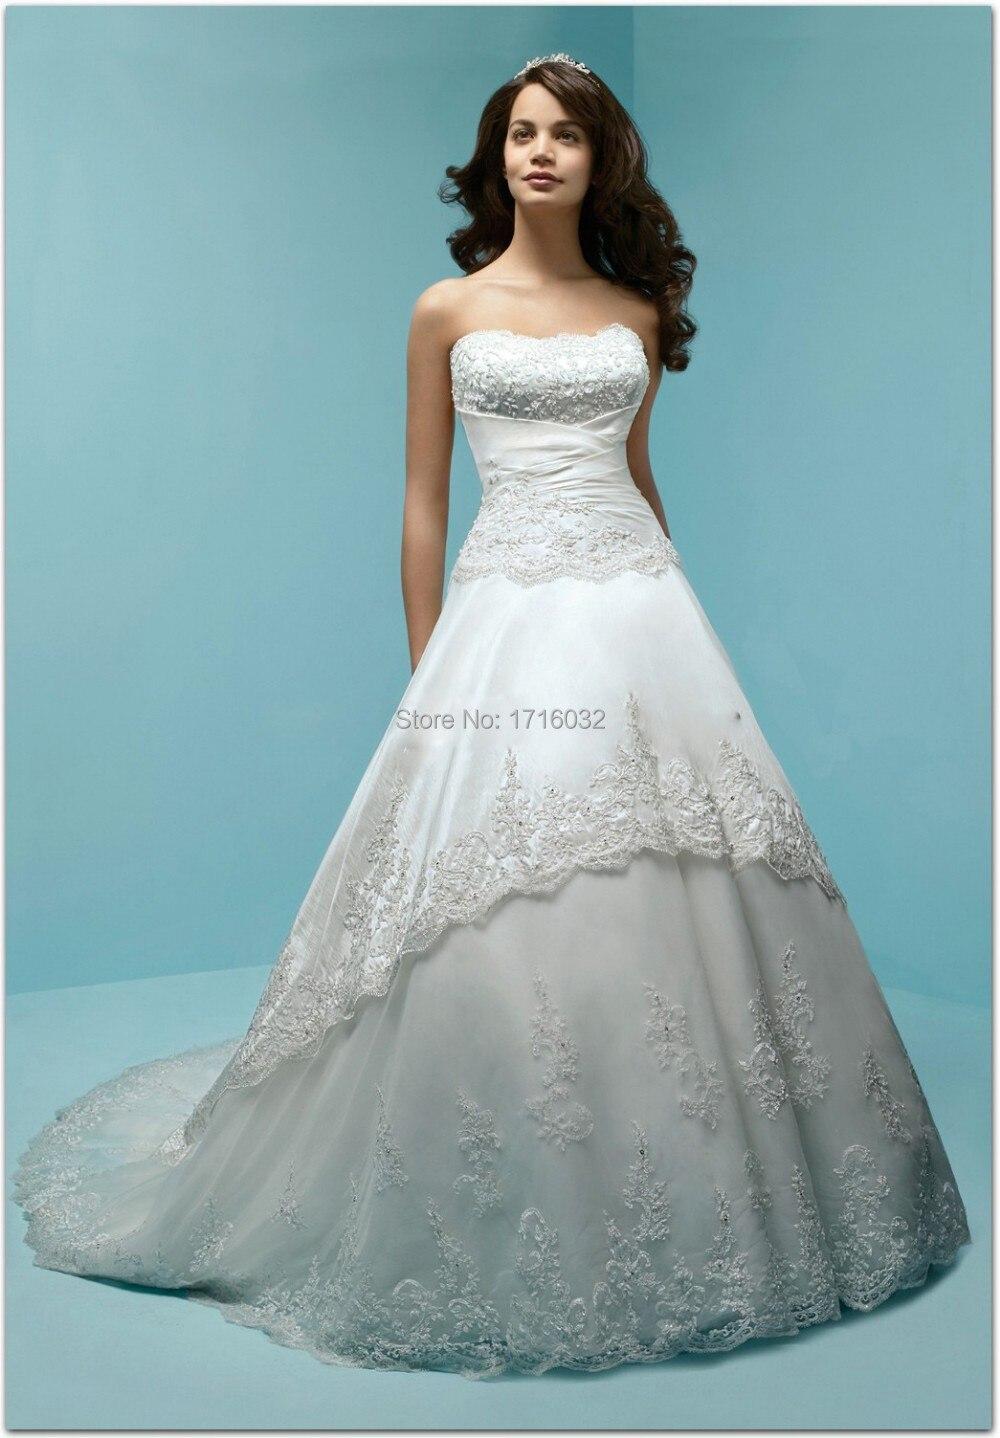 Nice Wrap Dresses For Weddings Crest - All Wedding Dresses ...